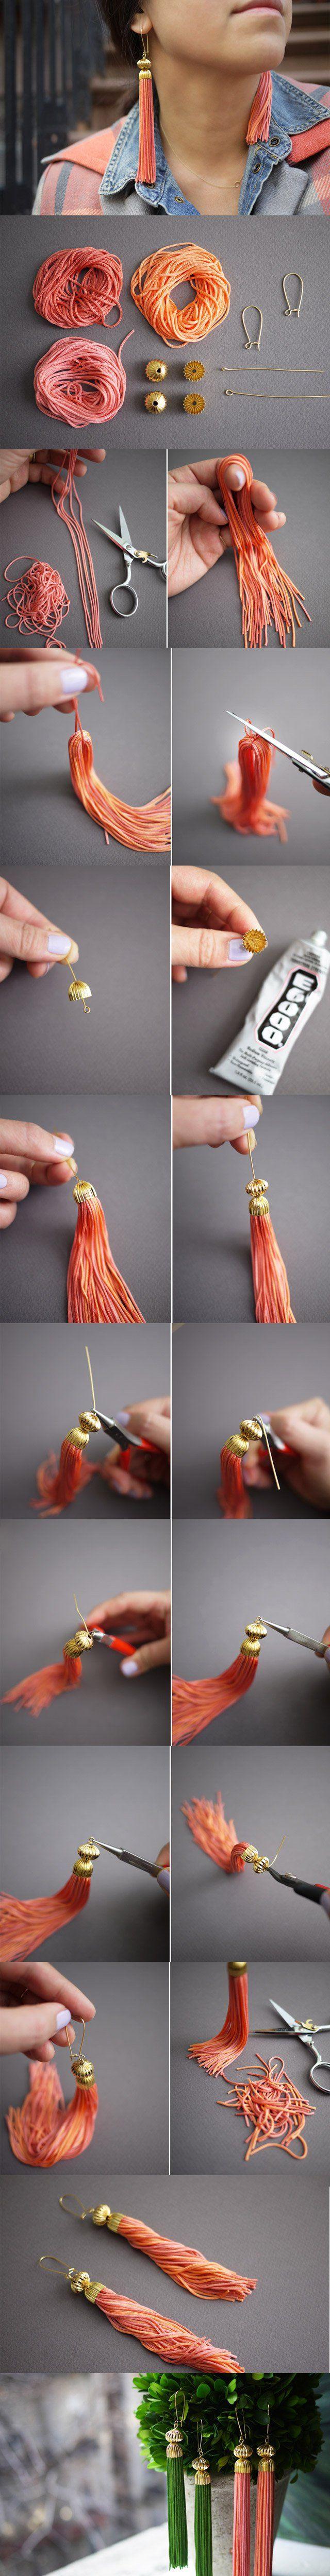 from the tassel earrings made